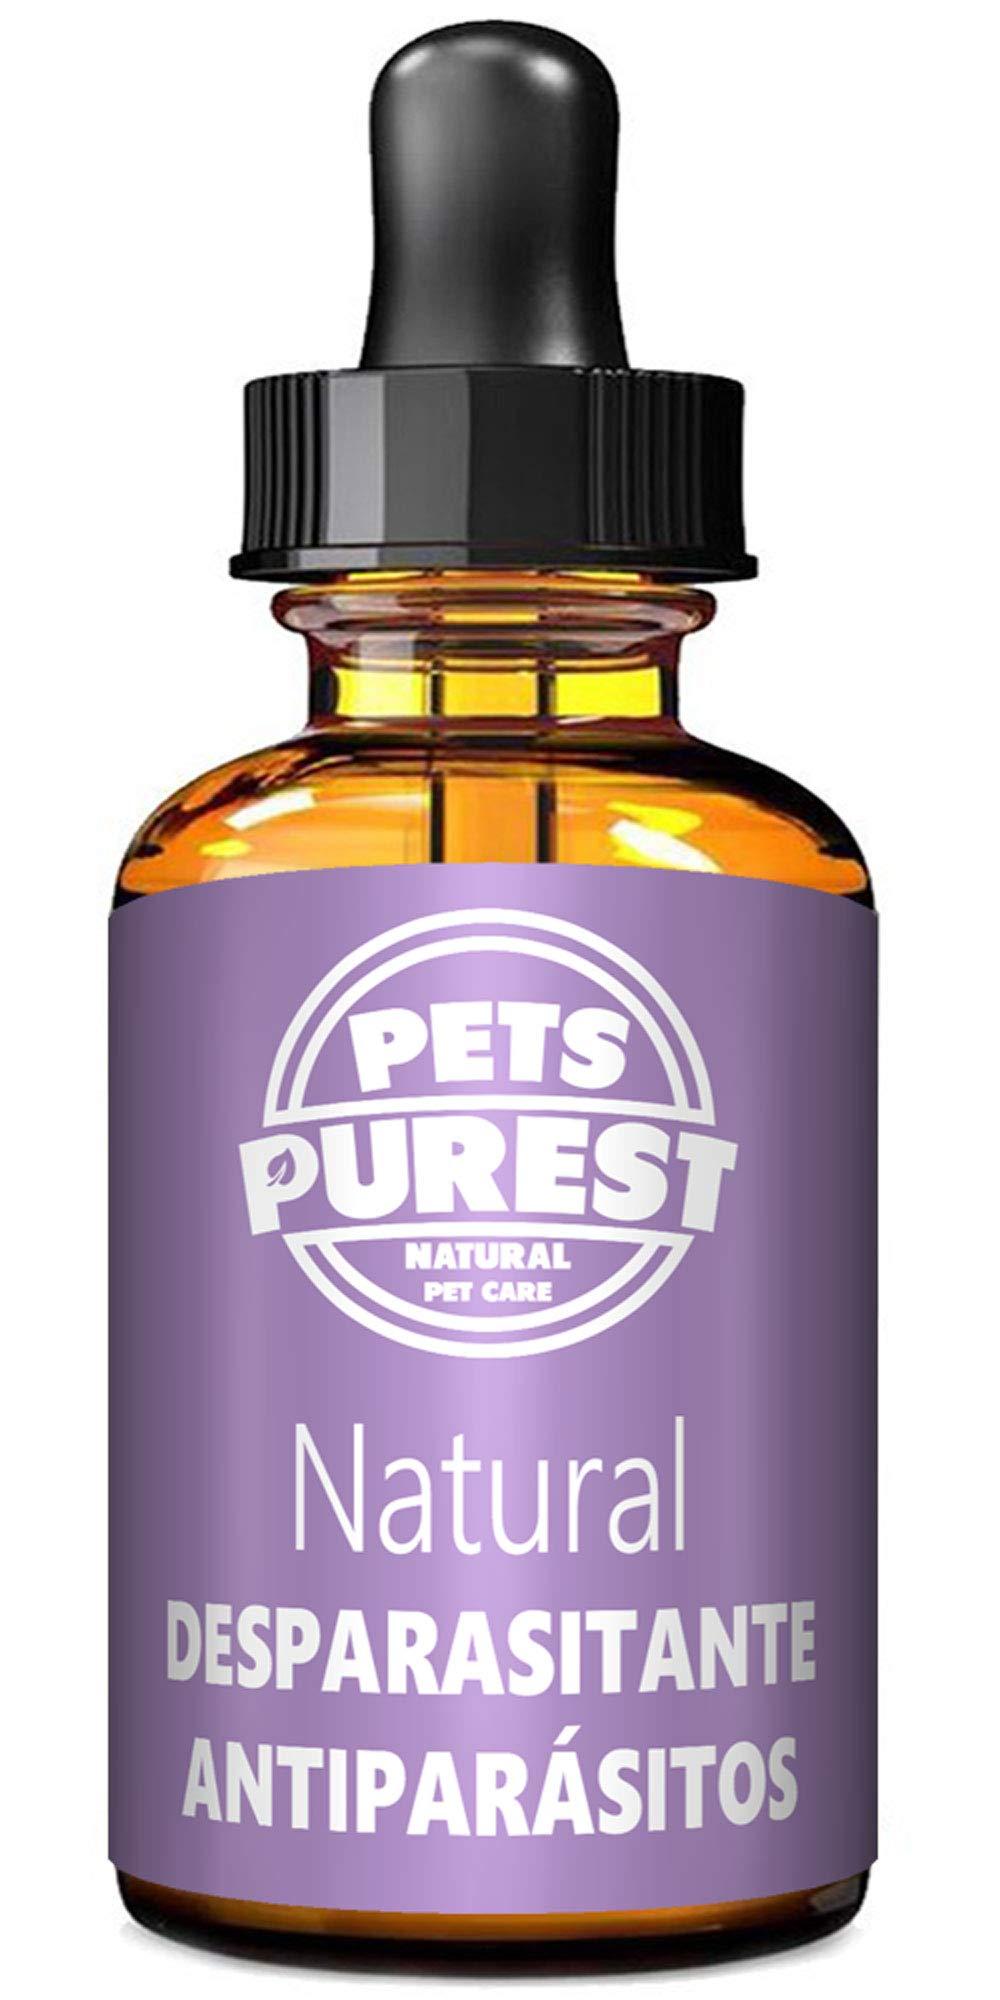 Comprar Desparasitante antiparasitario 100% natural para perros, gatos, aves, conejos Elimina gusanos lombrices intestinales anquilostomas gusano látigo